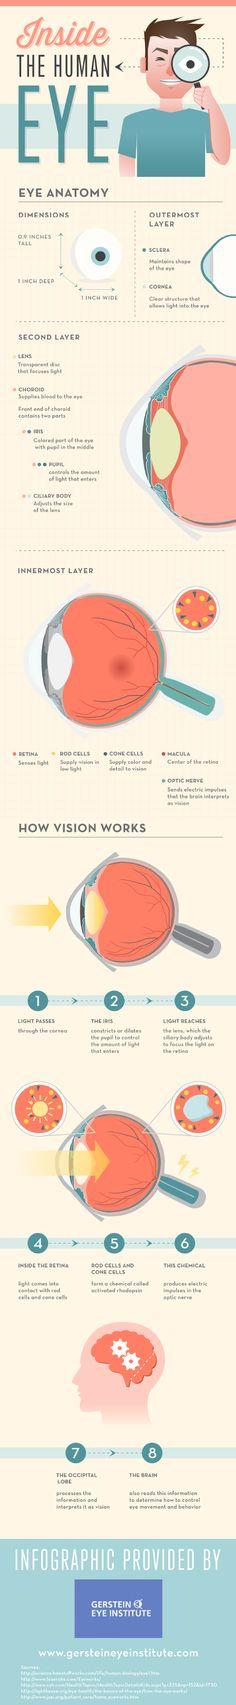 Inside The Human Eye